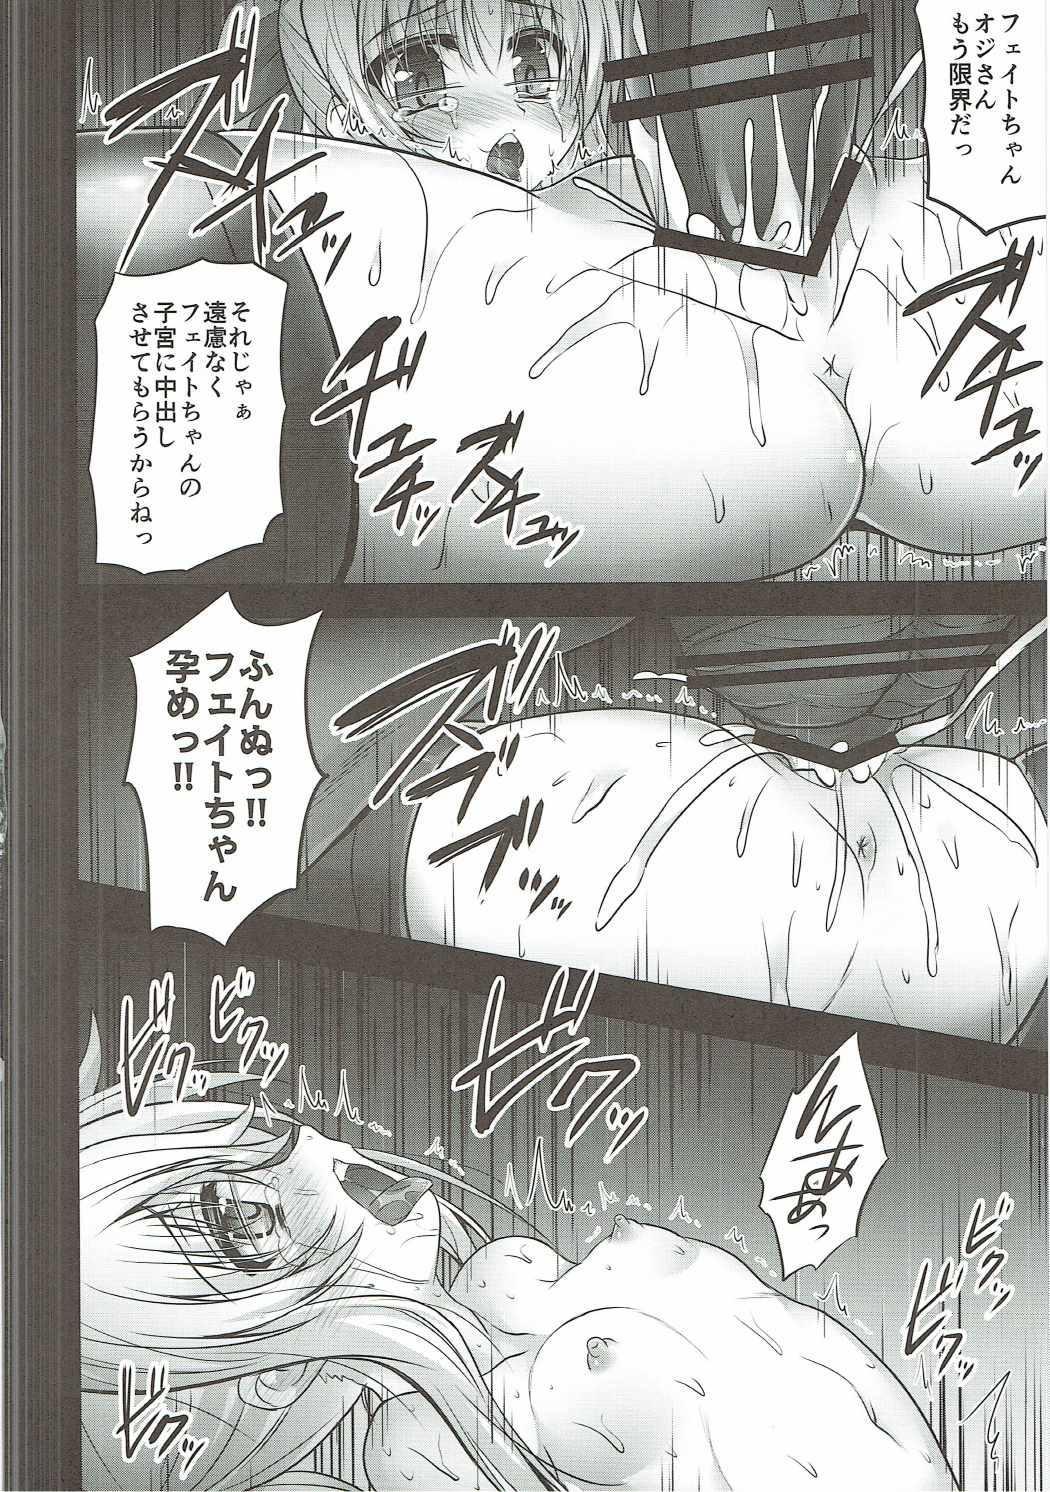 Fate-chan no Makura Eigyou 10